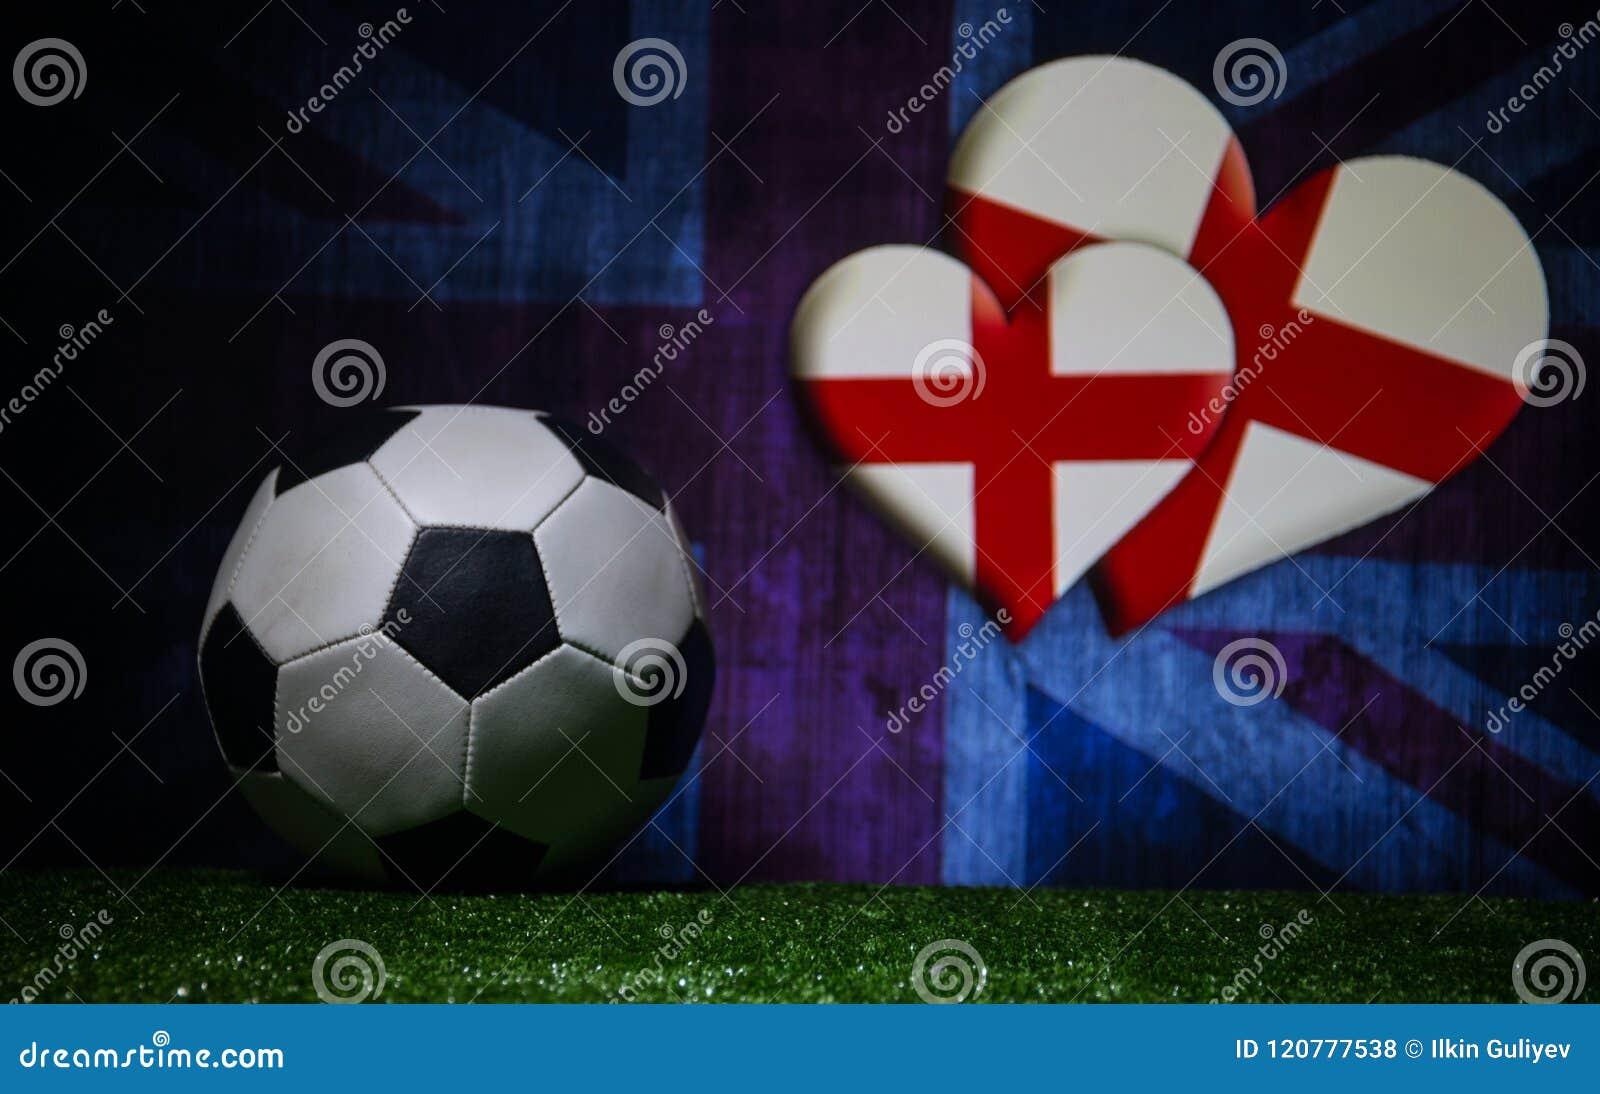 Soccer 2018. Creative concept. Soccer ball on green grass. Support England team concept